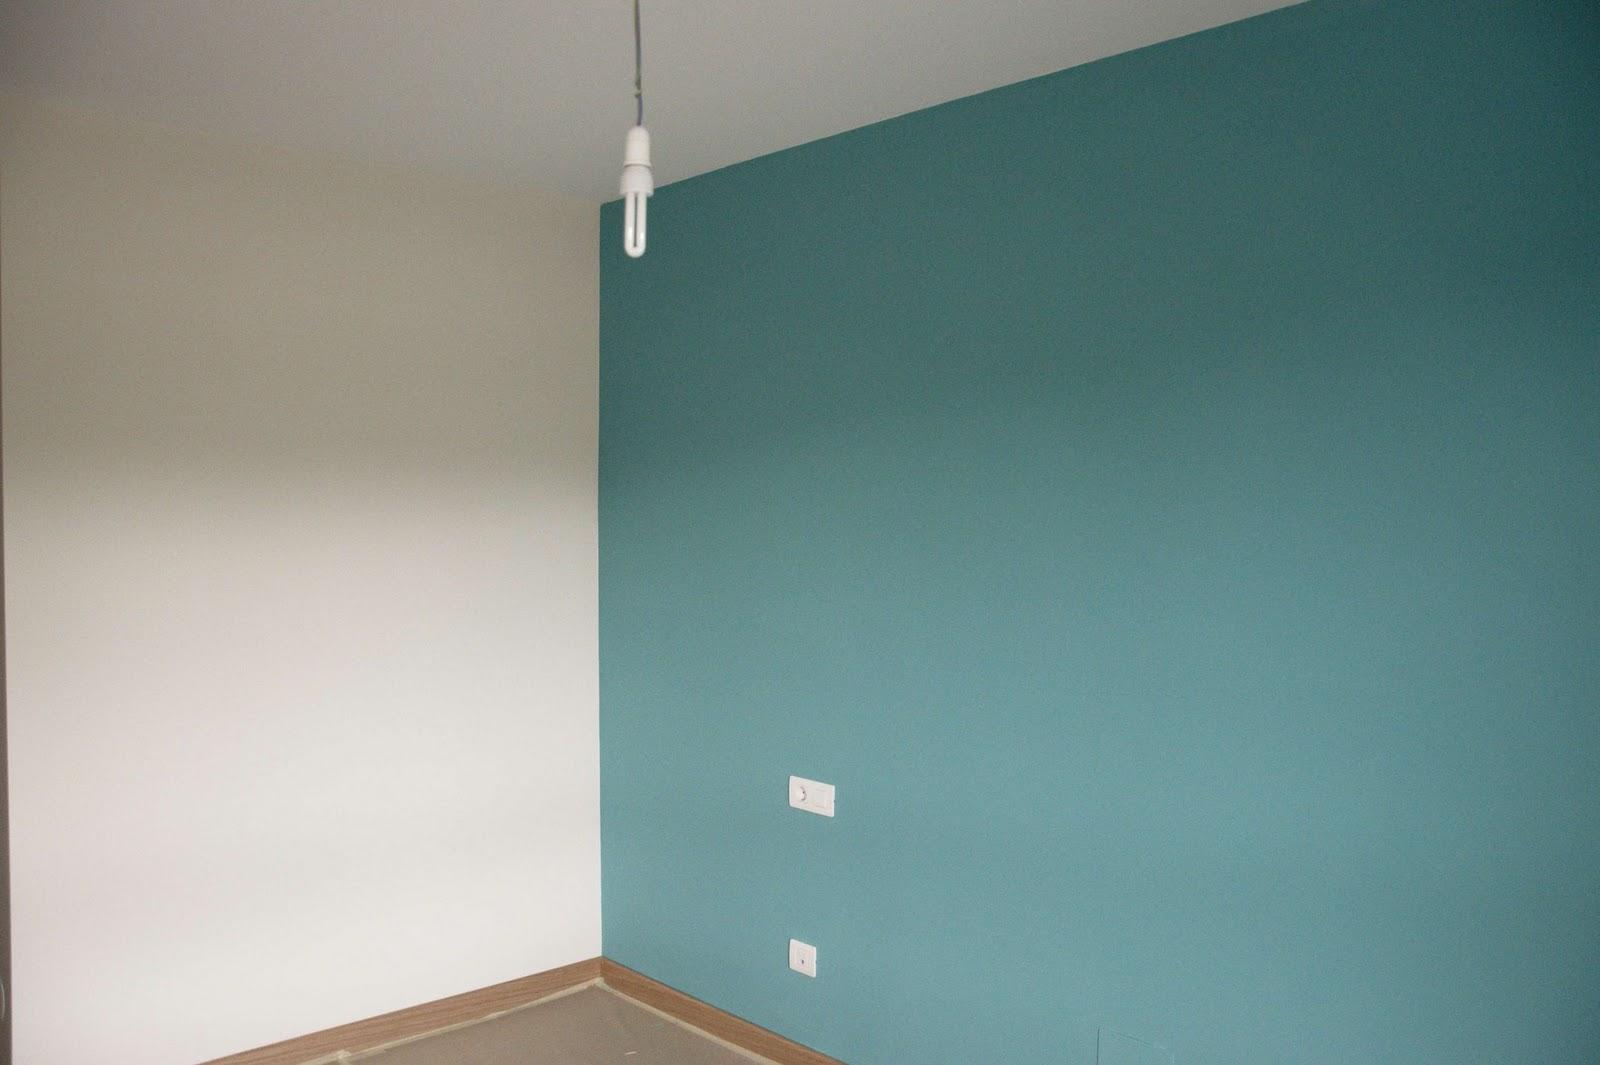 Isaac pintura un piso por 800 - Como pintar una pared ya pintada ...